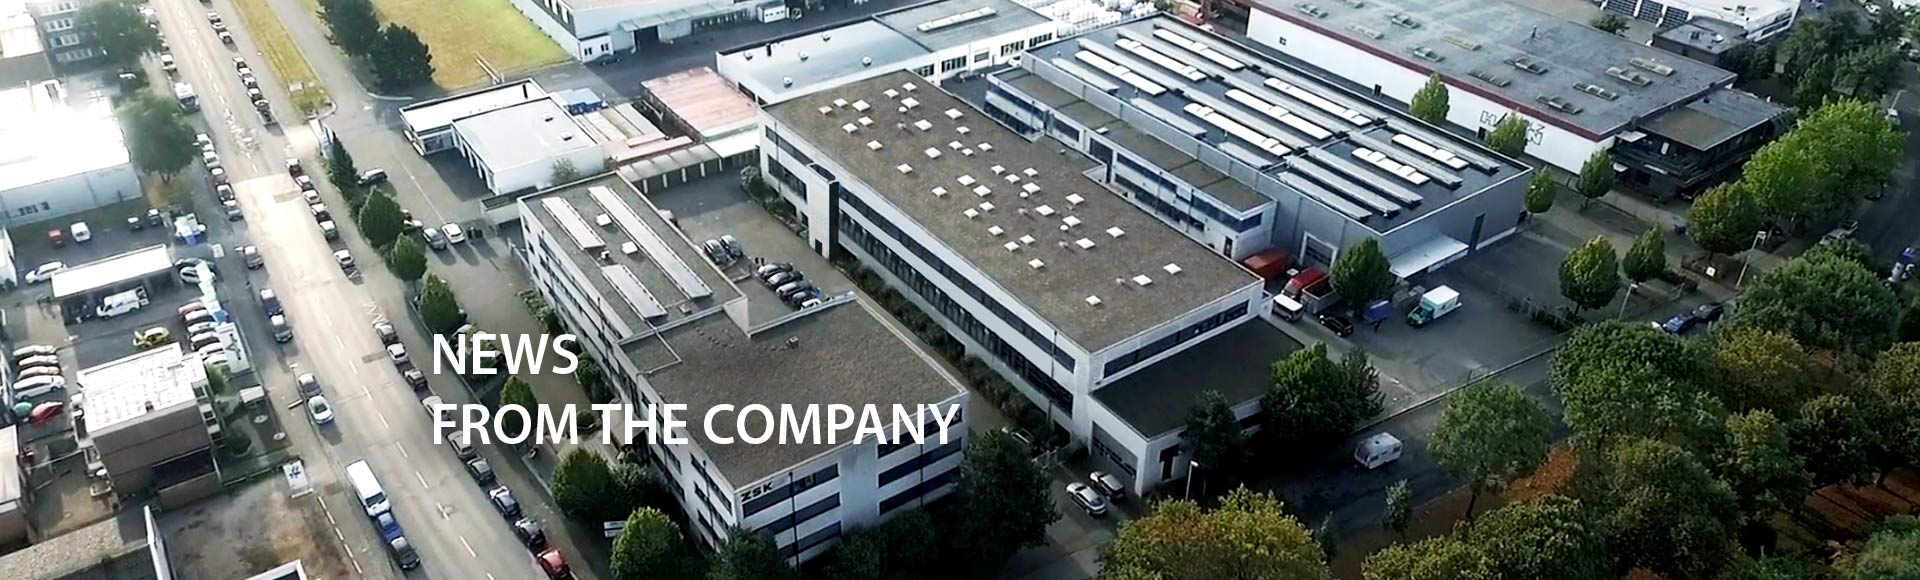 ZSK STICKMASCHINEN - News from the company